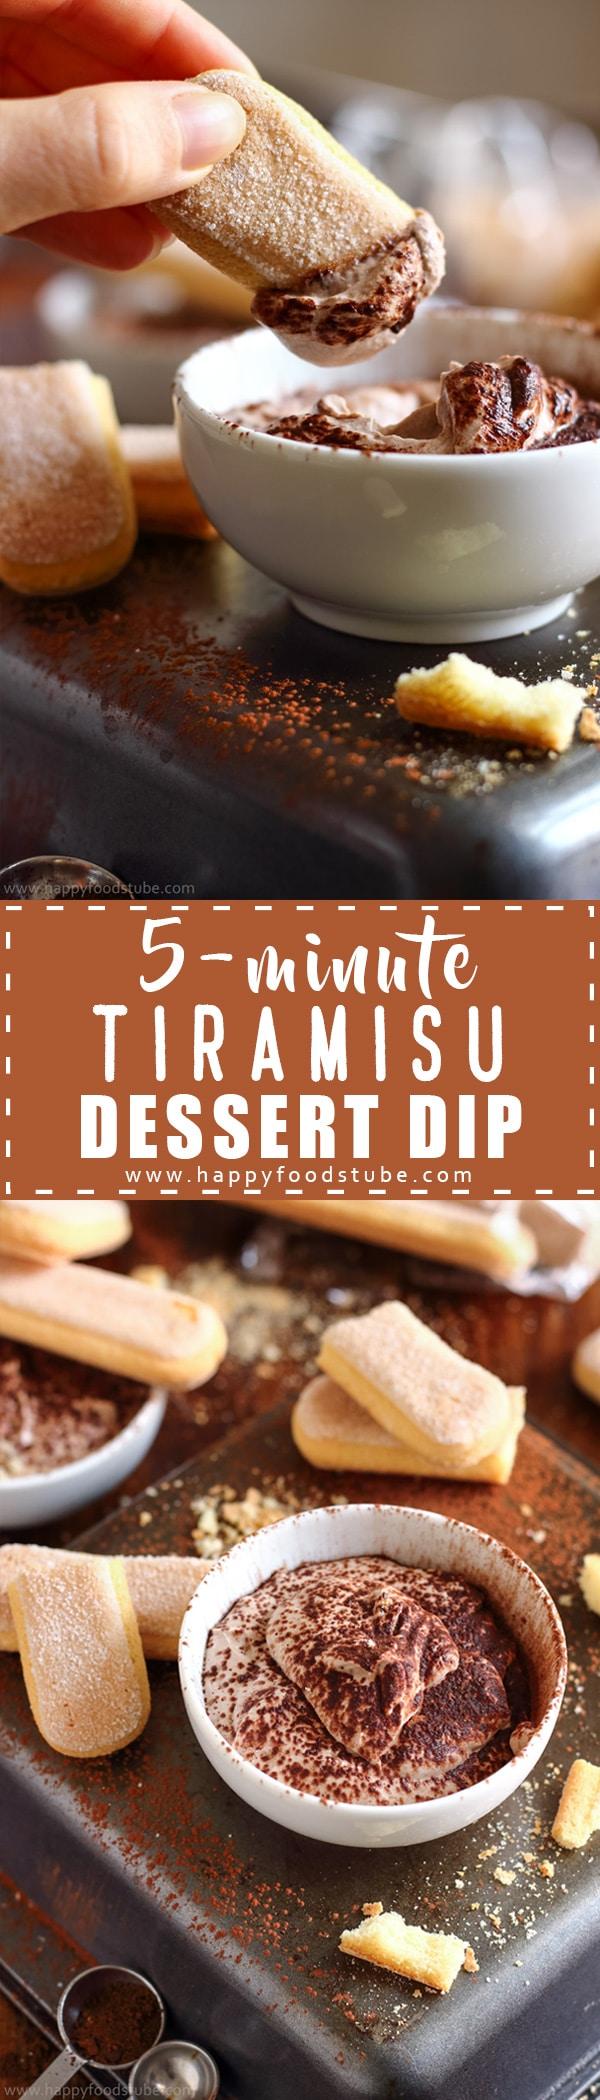 Easy 5-minute tiramisu dessert dip recipe. This rich & creamy dip made with mascarpone, cream, cocoa & coffee tastes like real tiramisu